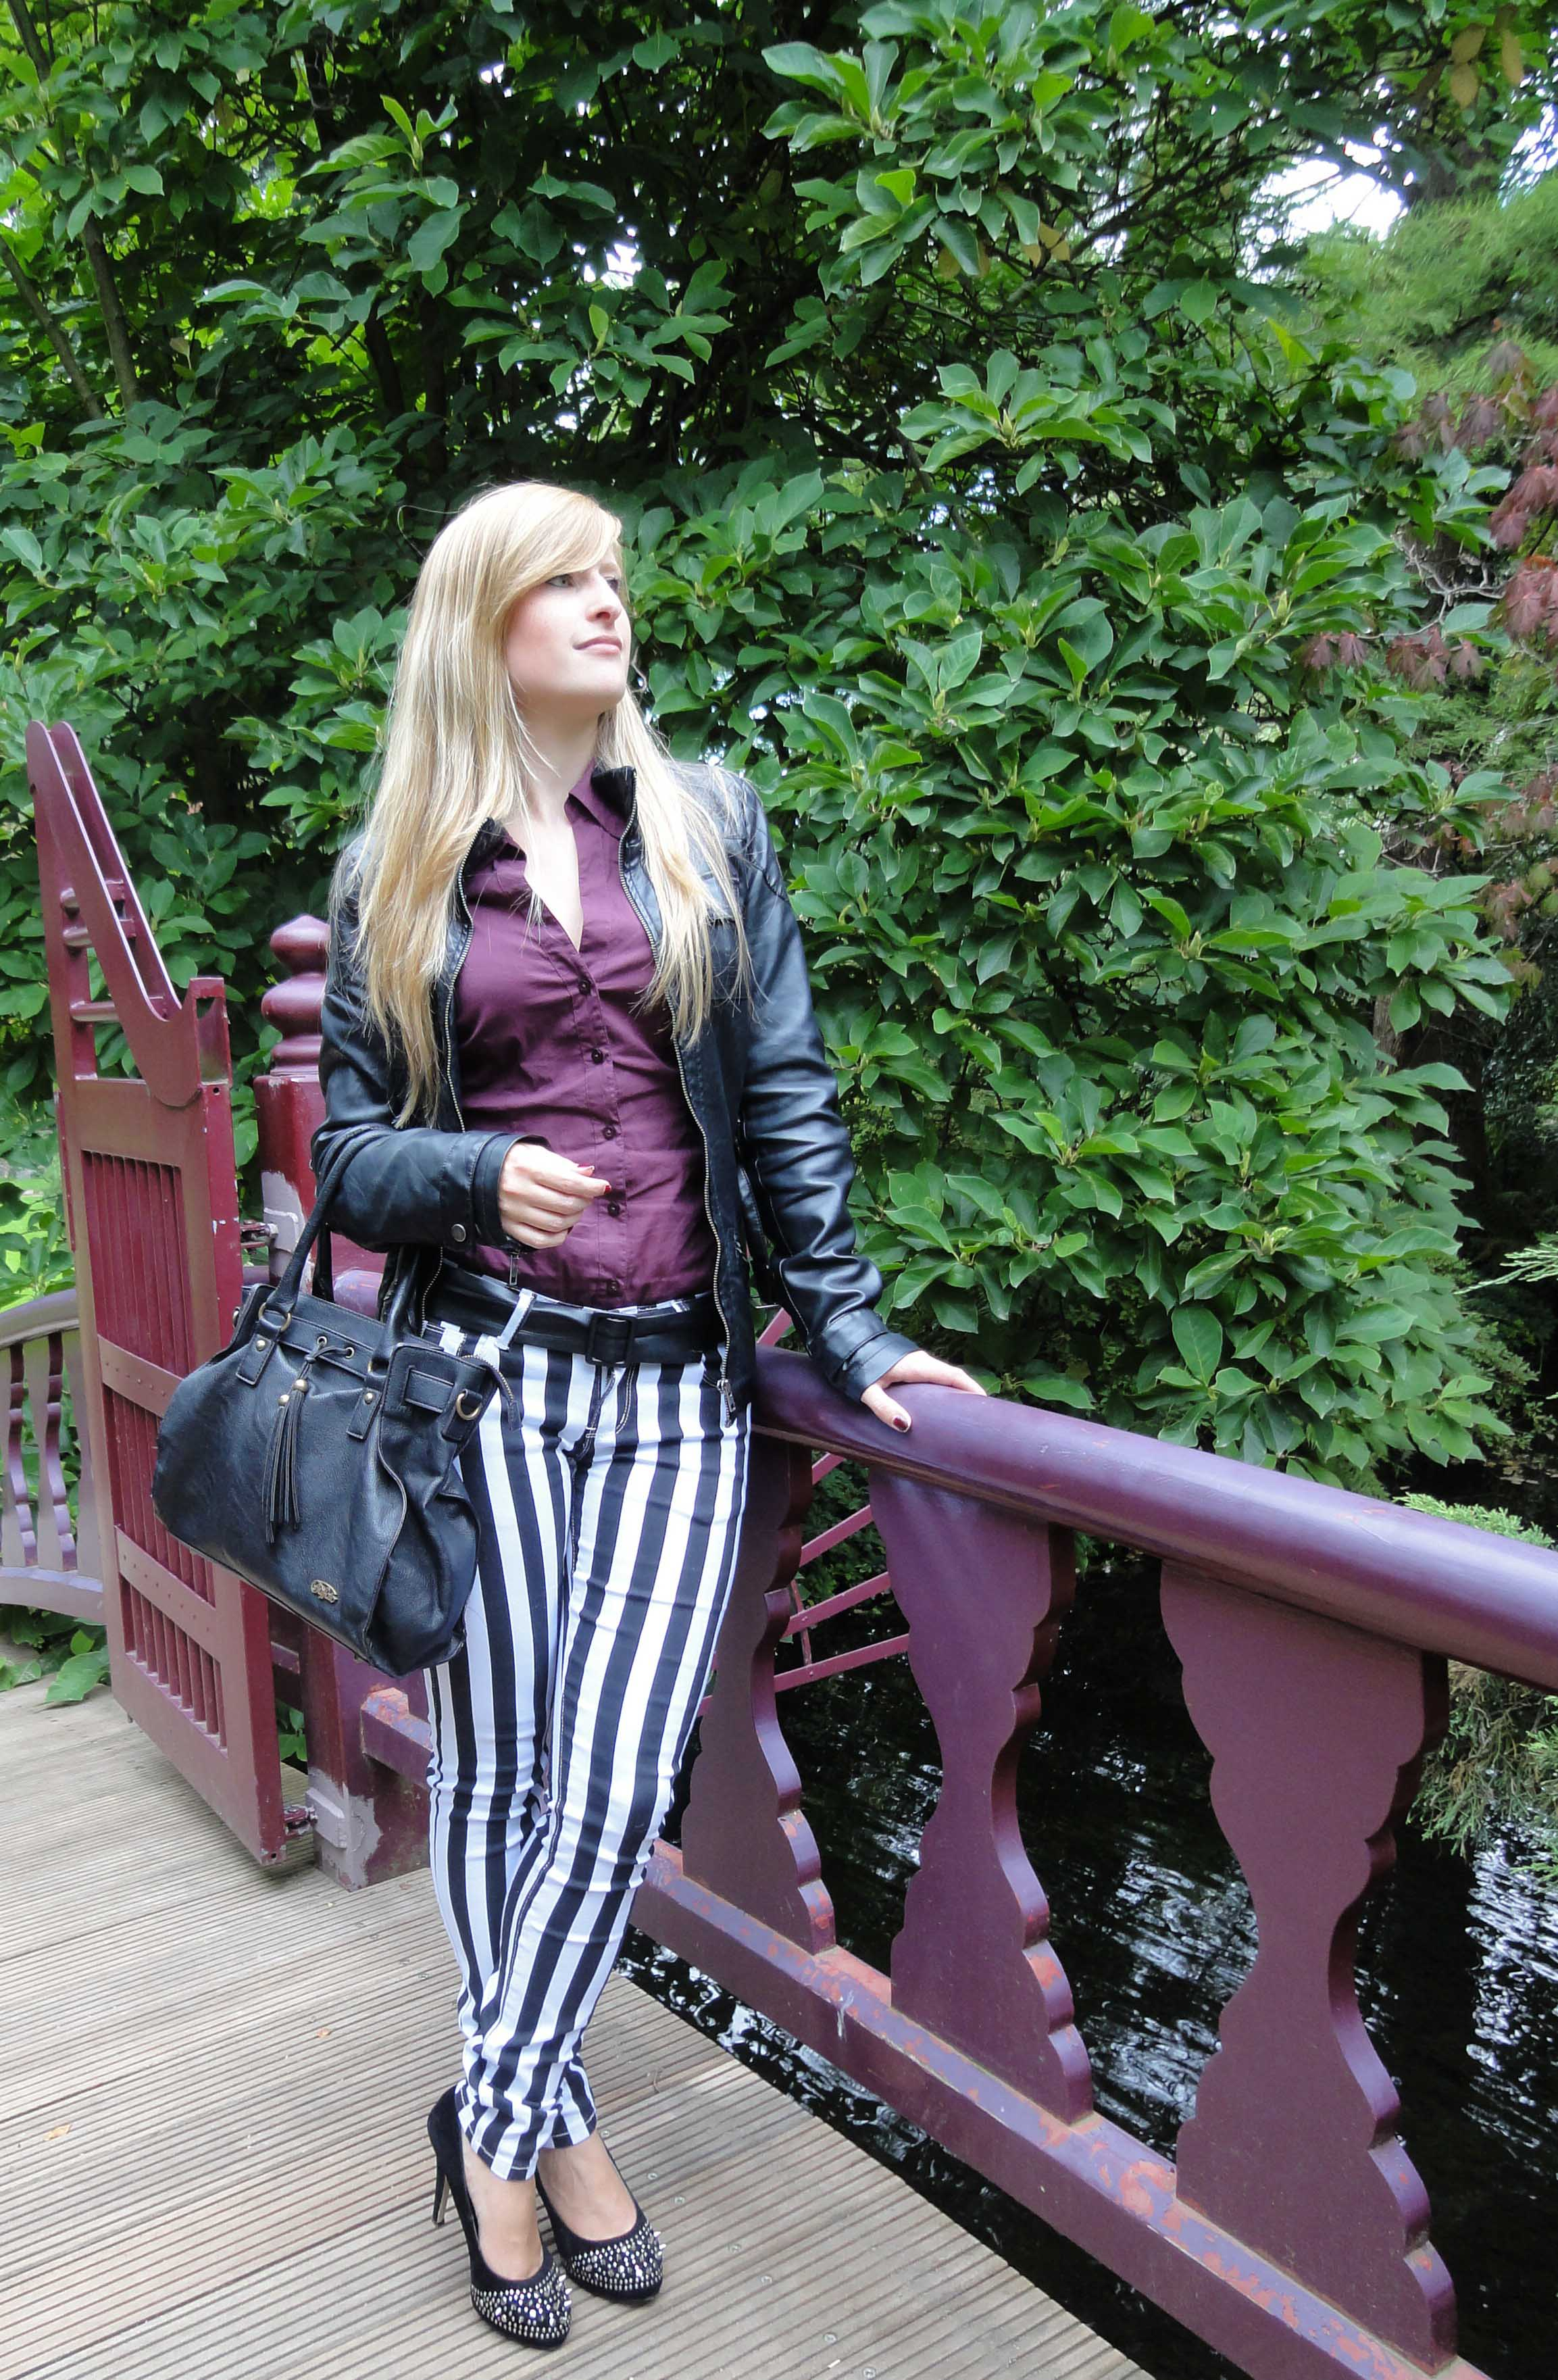 Stripes Rules Modeblog schwarz weiß gestreifte Hose kombinieren streifen Outfit schwarze Lederjacke jajpanischer Garten